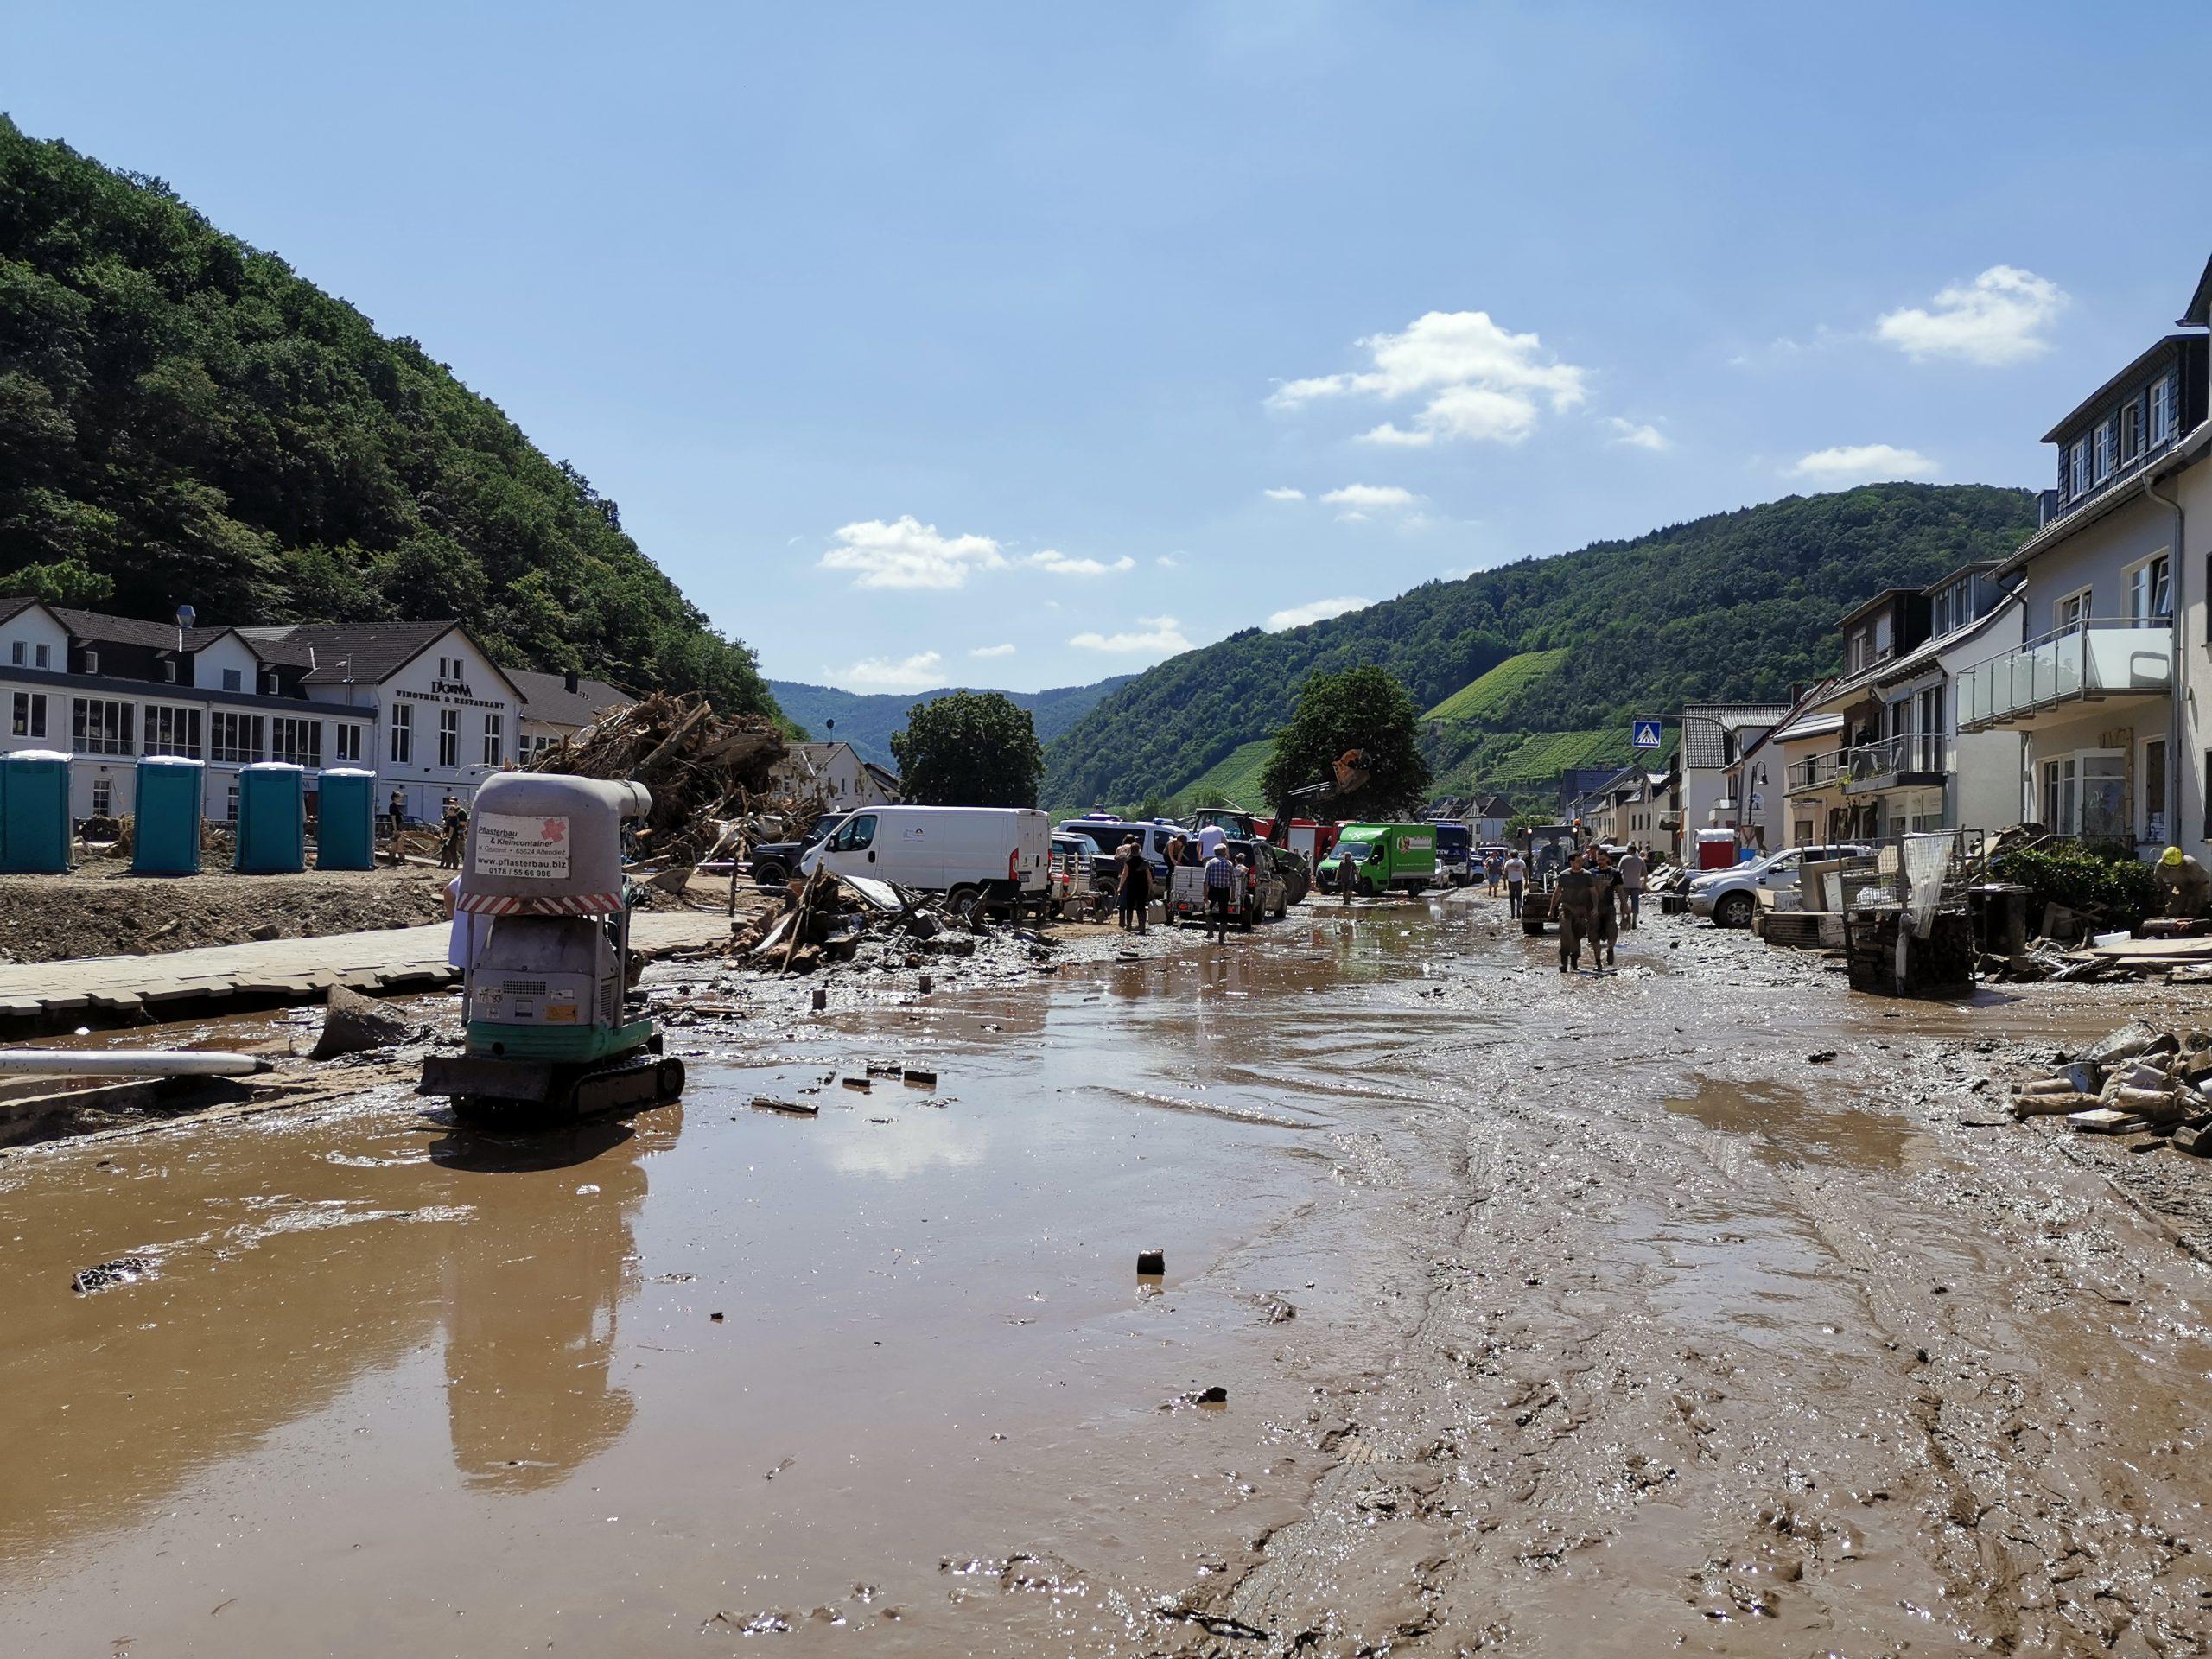 Aftermath of Devastating Flood in Germany